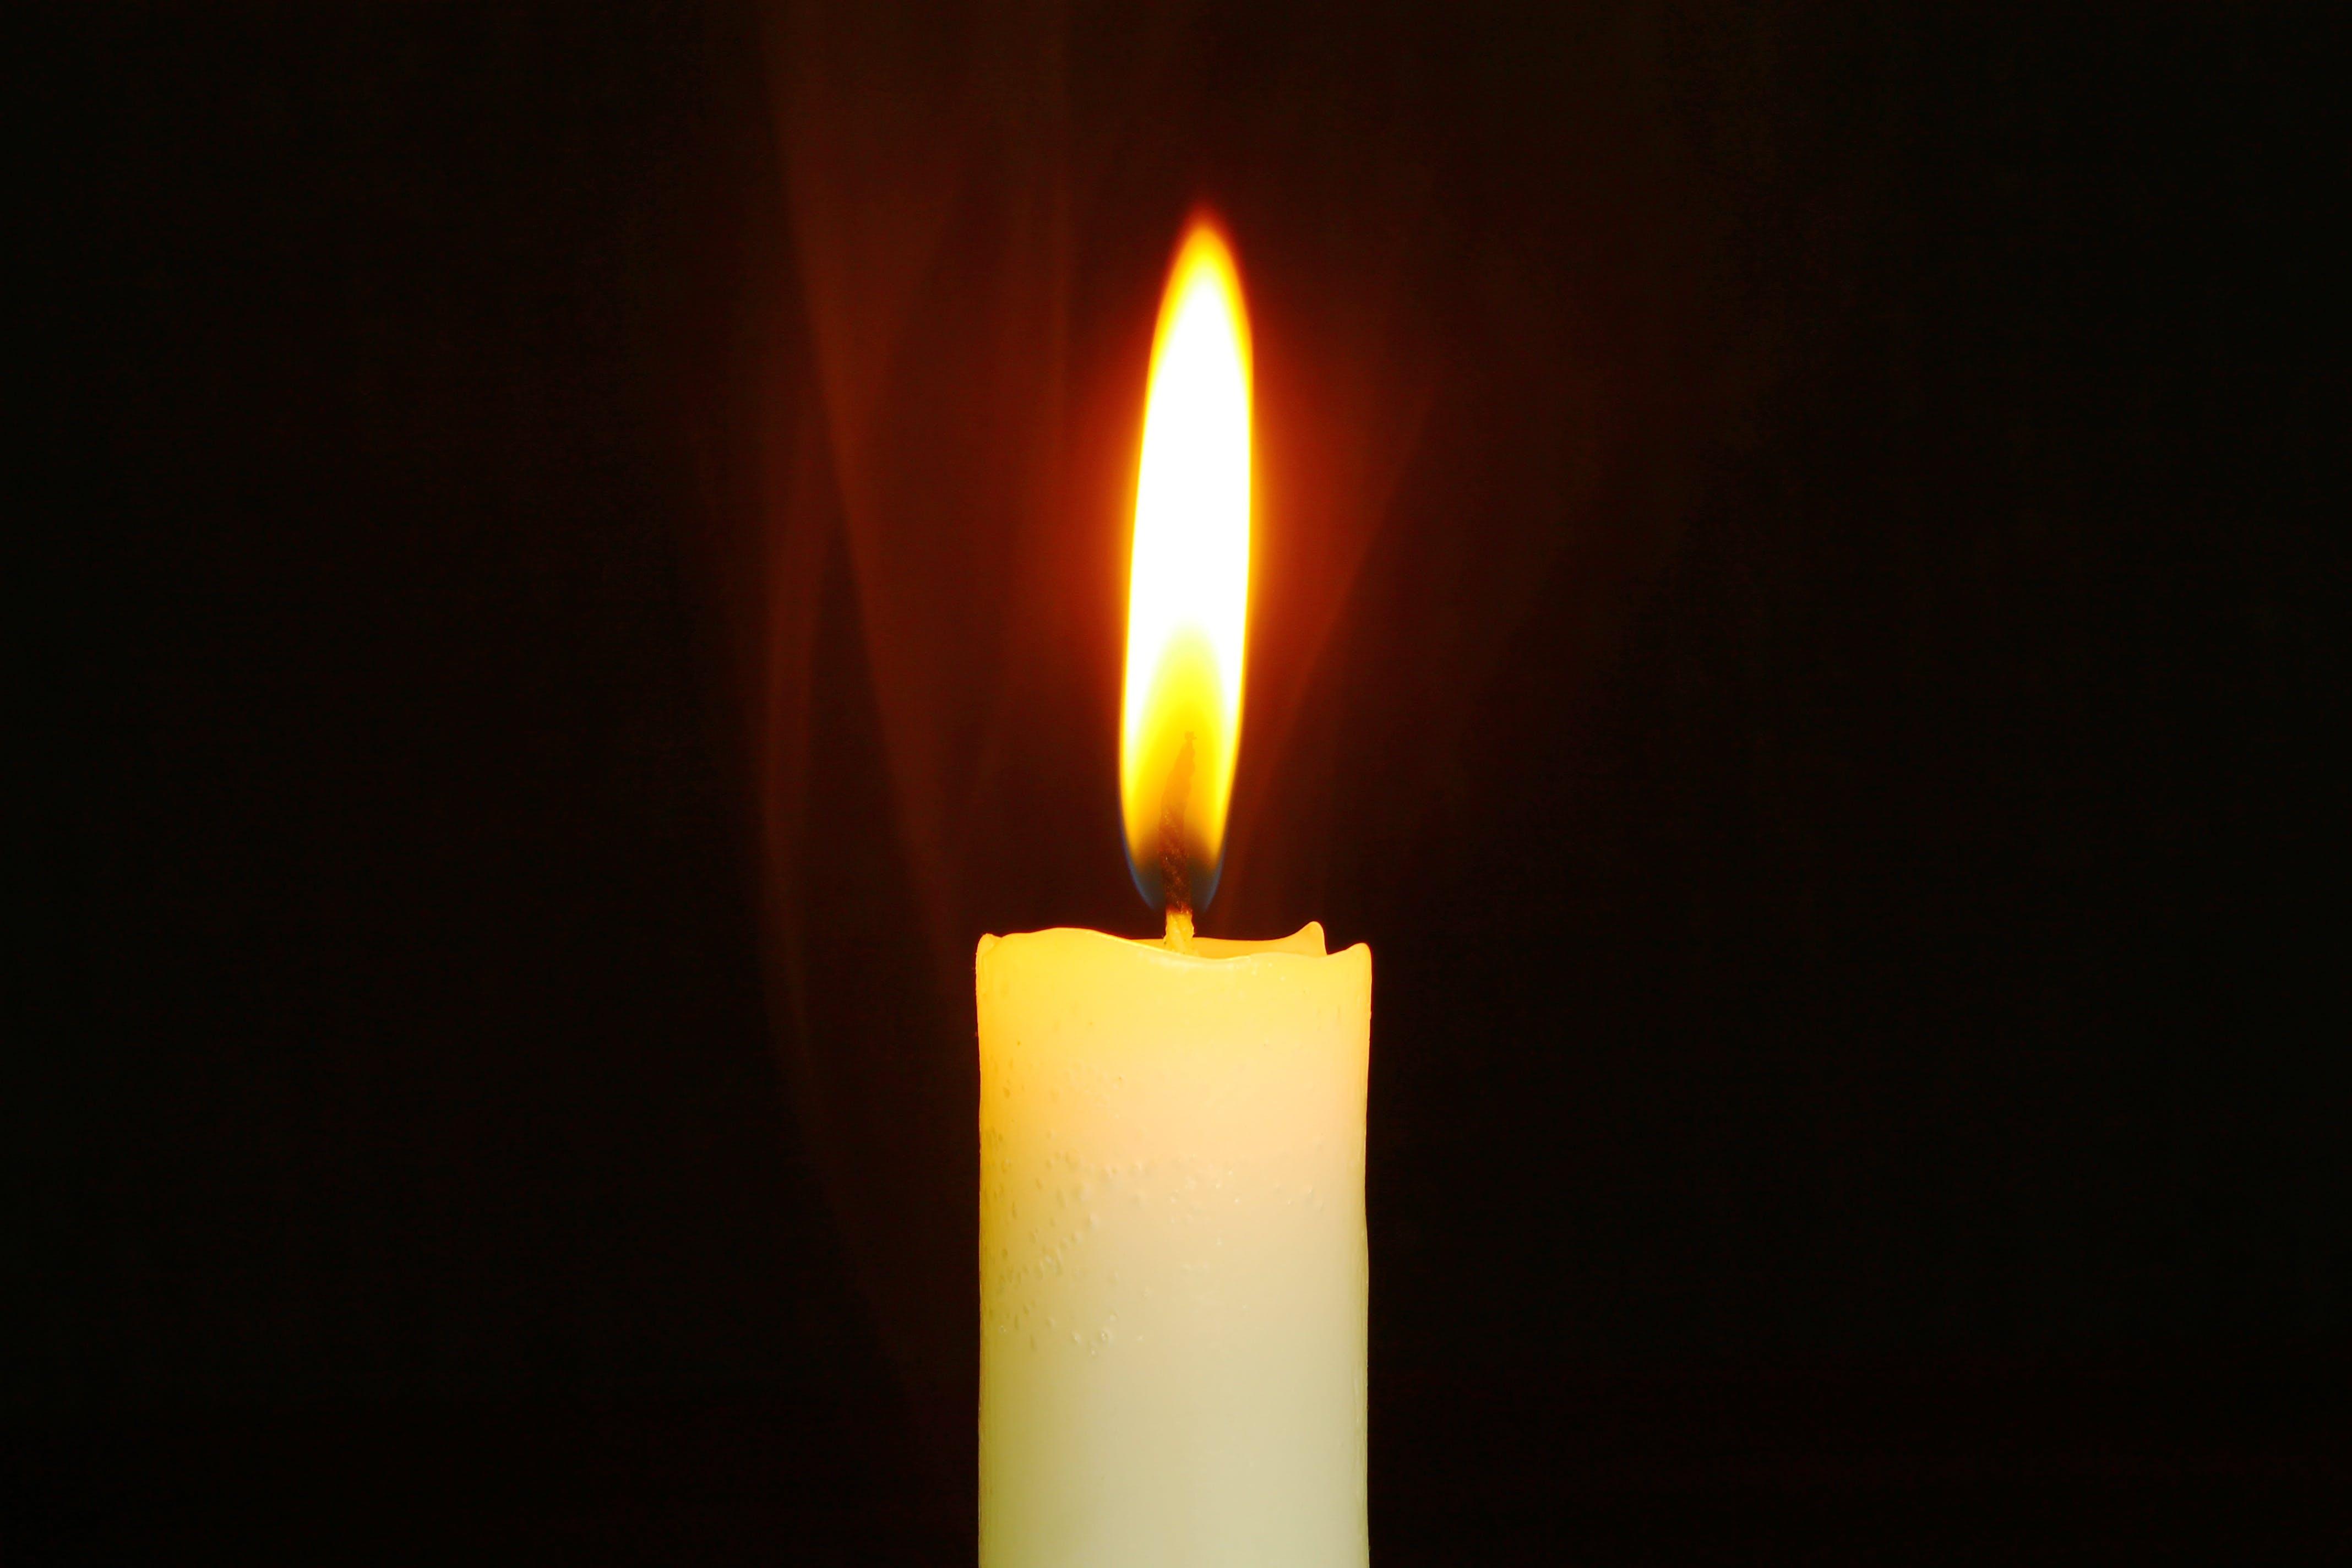 beleuchtet, brennen, dunkel